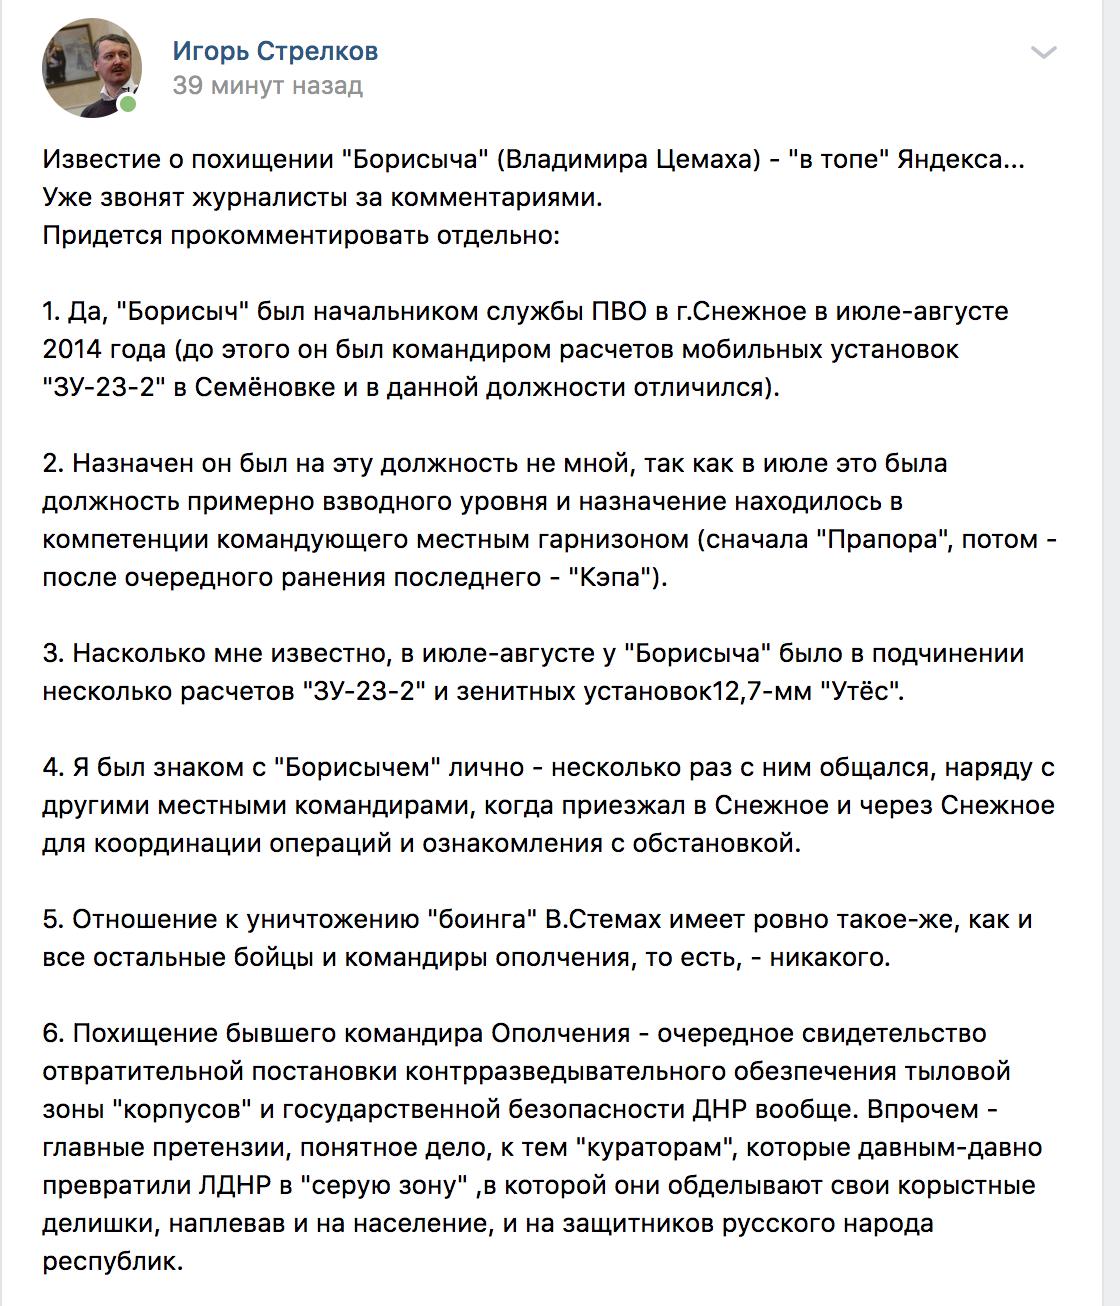 https://v-variant.com.ua/uploads/posts/2019-07/1562311583_snimok-jekrana-2019-07-05-v-10_23_21.png